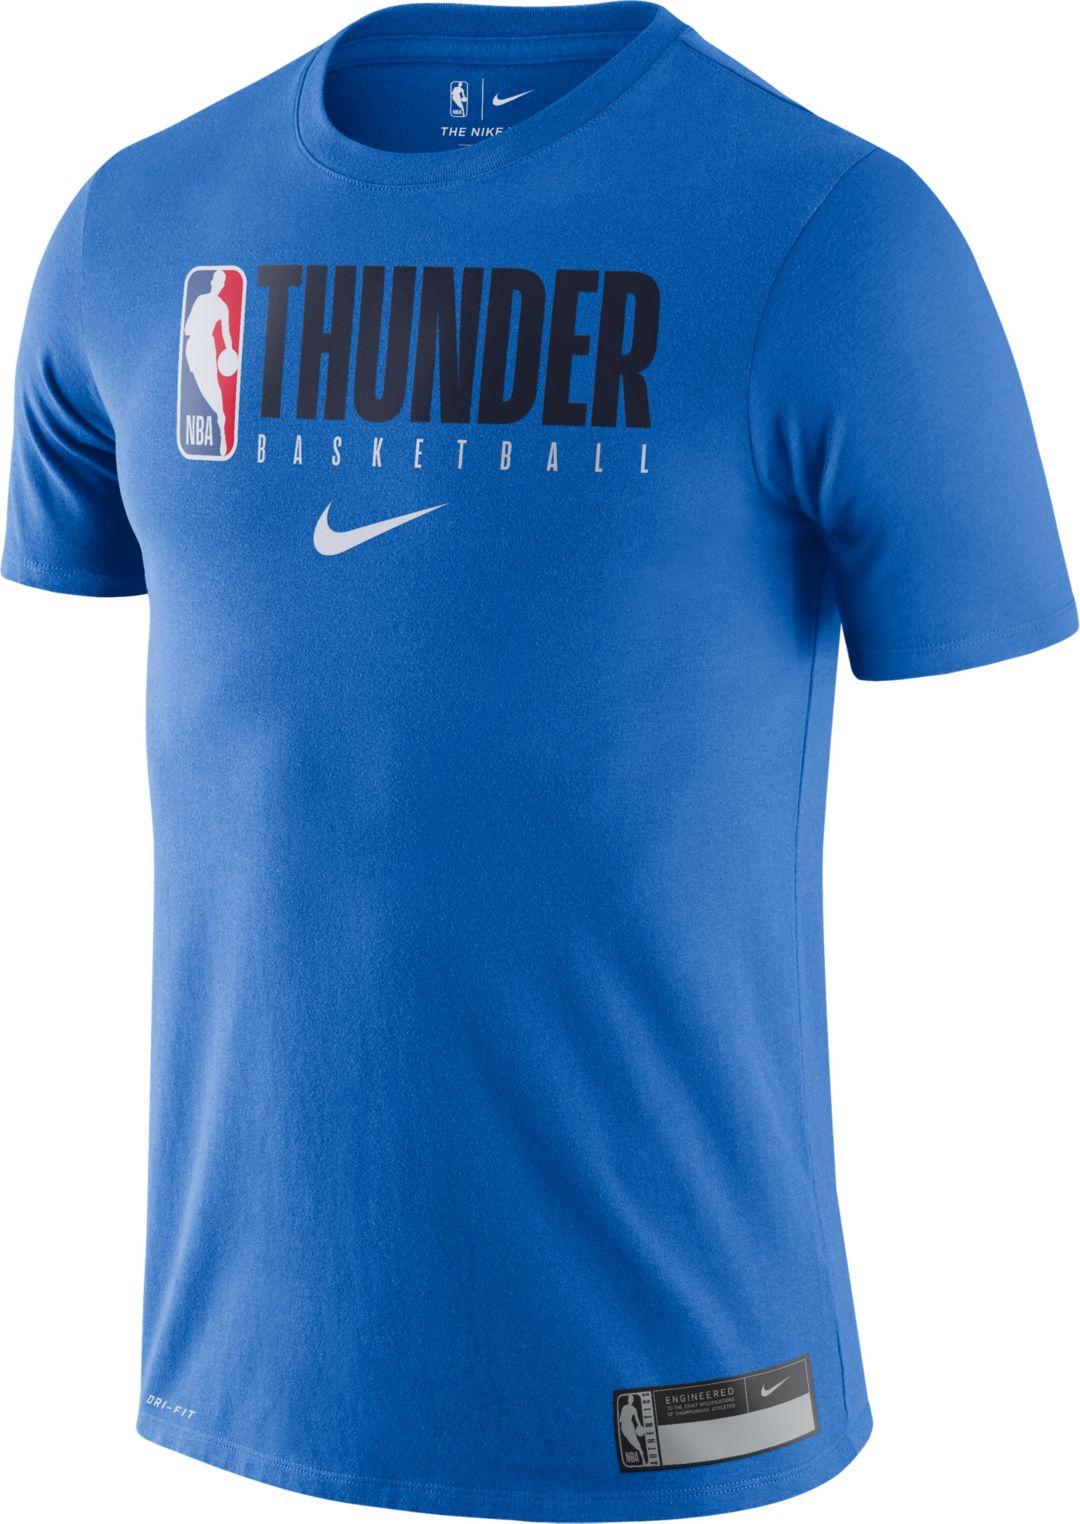 sports shoes 1cb0a a16ca Nike Men's Oklahoma City Thunder Dri-FIT Practice T-Shirt